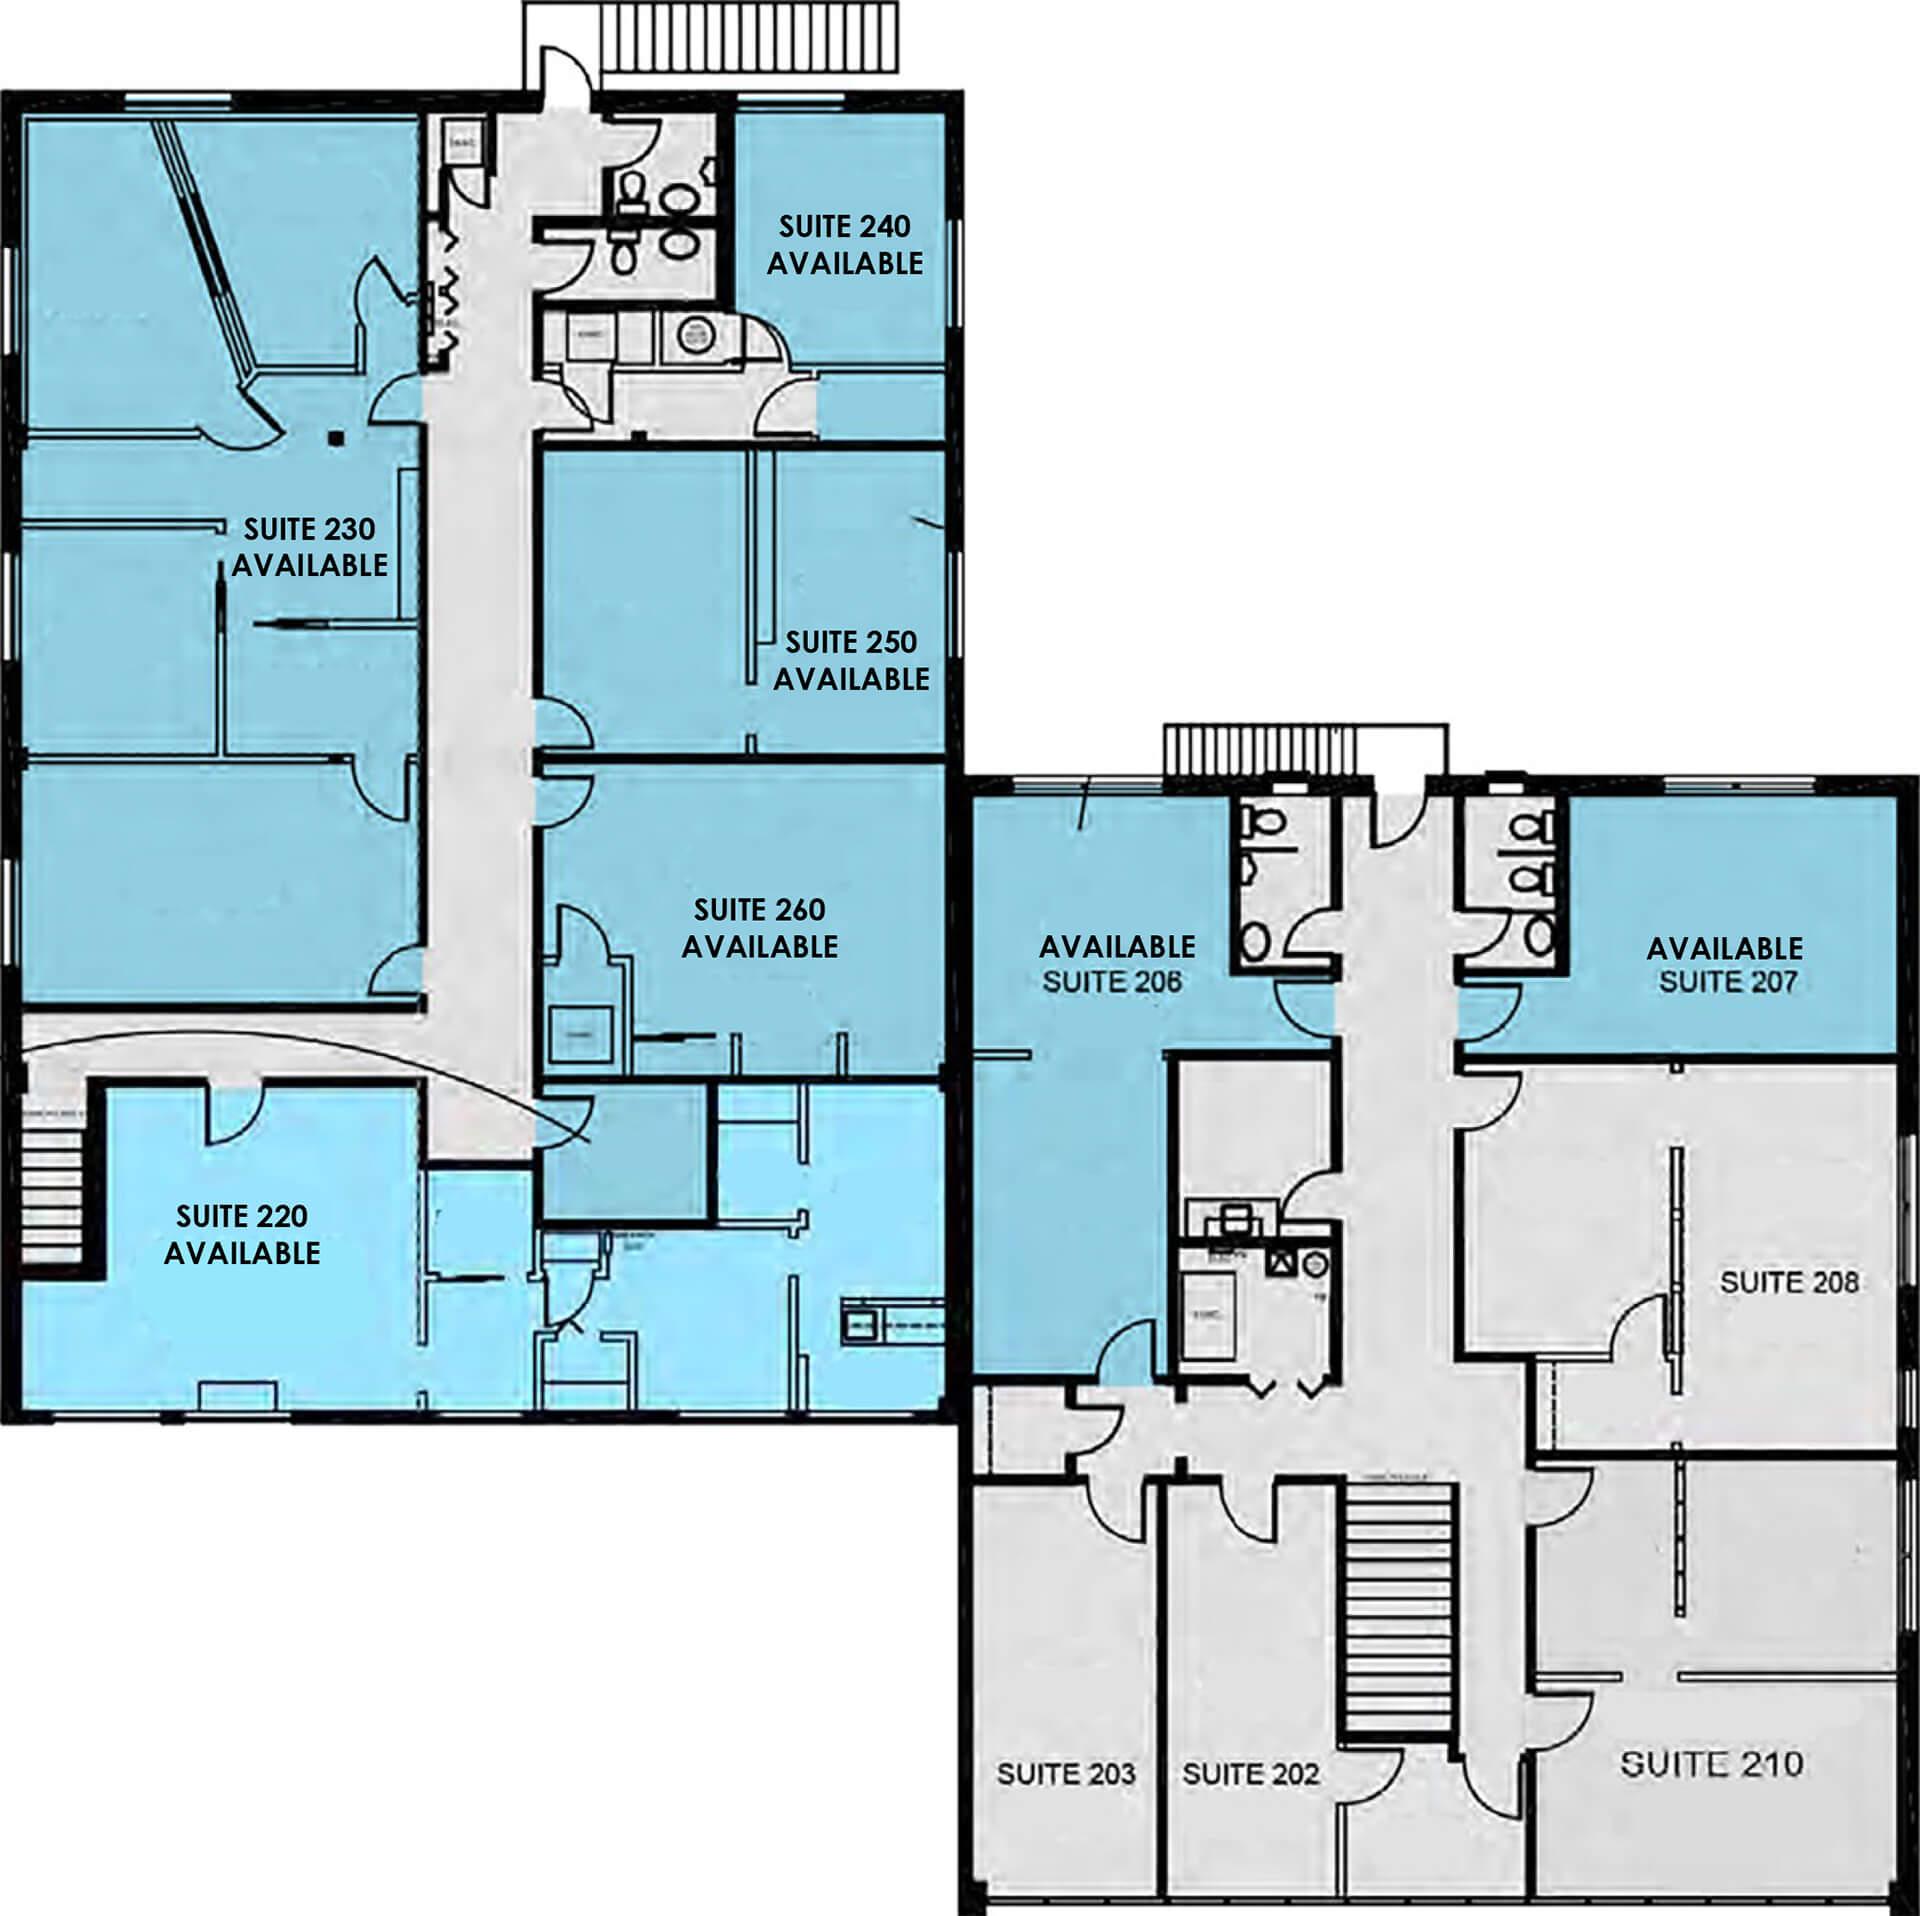 Floor Plan 629 W. 19th